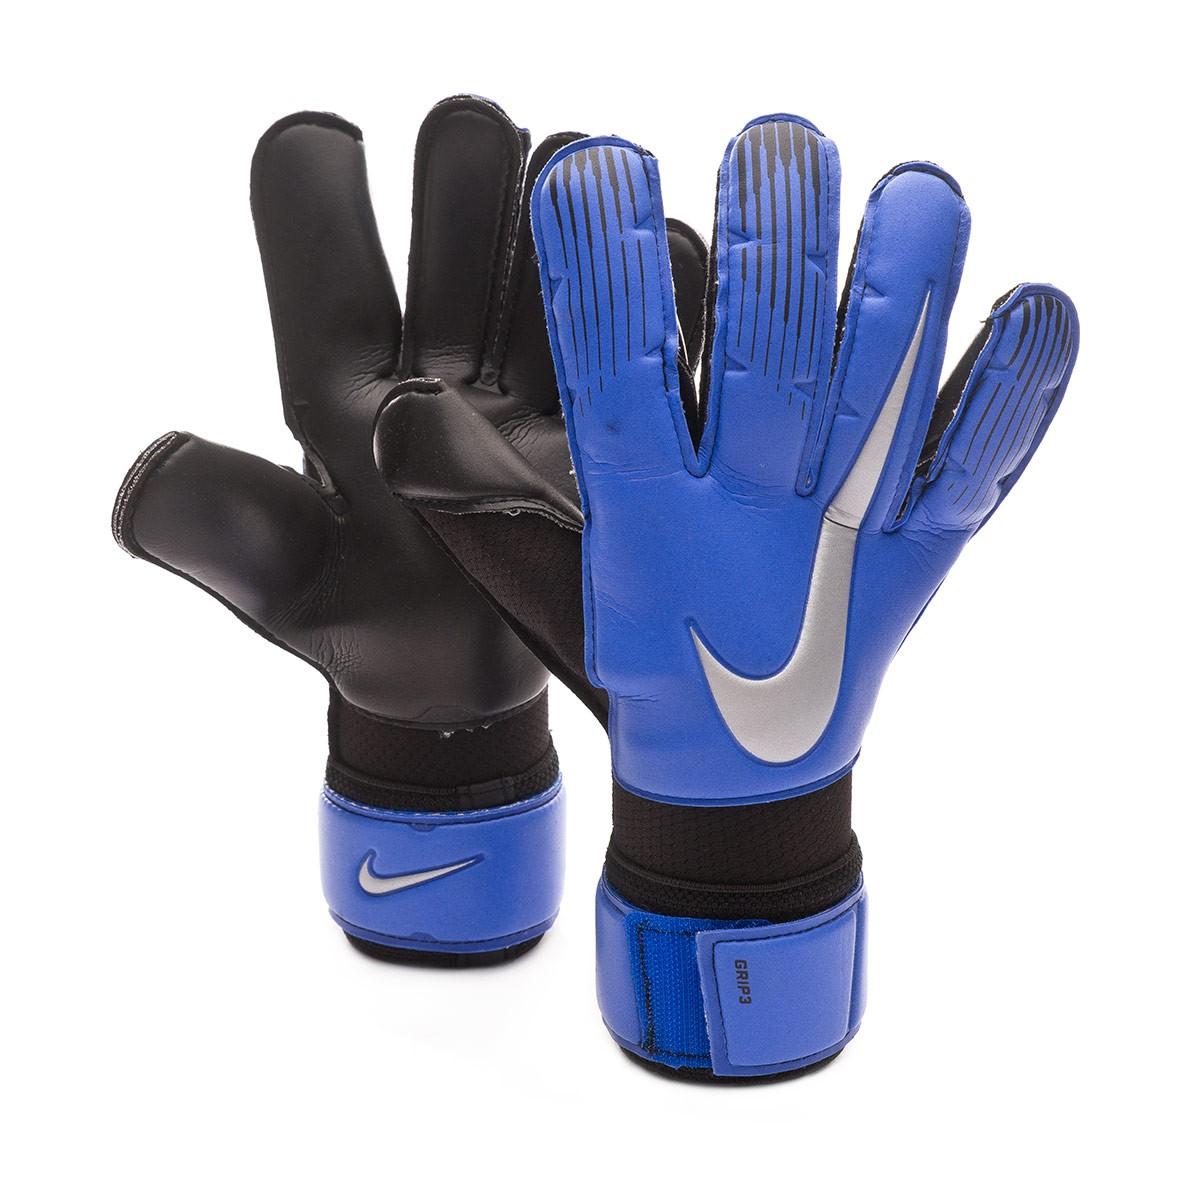 81833a3eb Glove Nike Grip 3 Racer blue-Black-Metallic silver - Football store Fútbol  Emotion